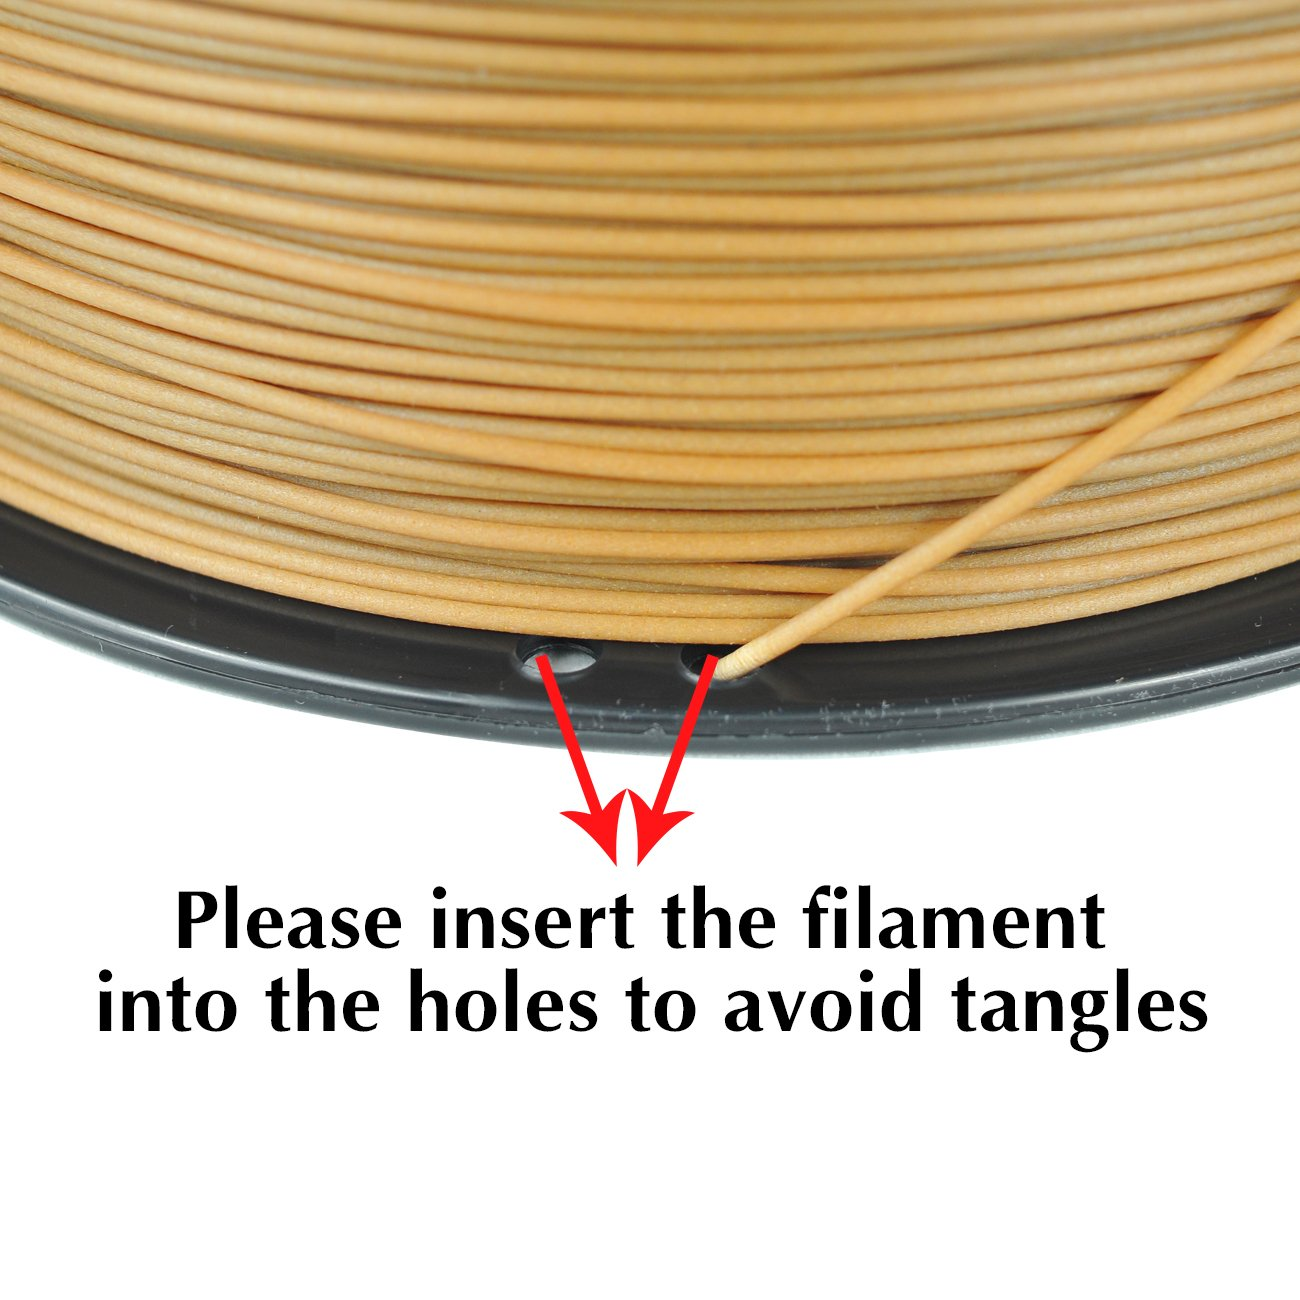 1.75 mm,Wood PRILINE Wood-1KG 1.75 3D Printer Filament 1kg Spool Dimensional Accuracy +//- 0.03 mm